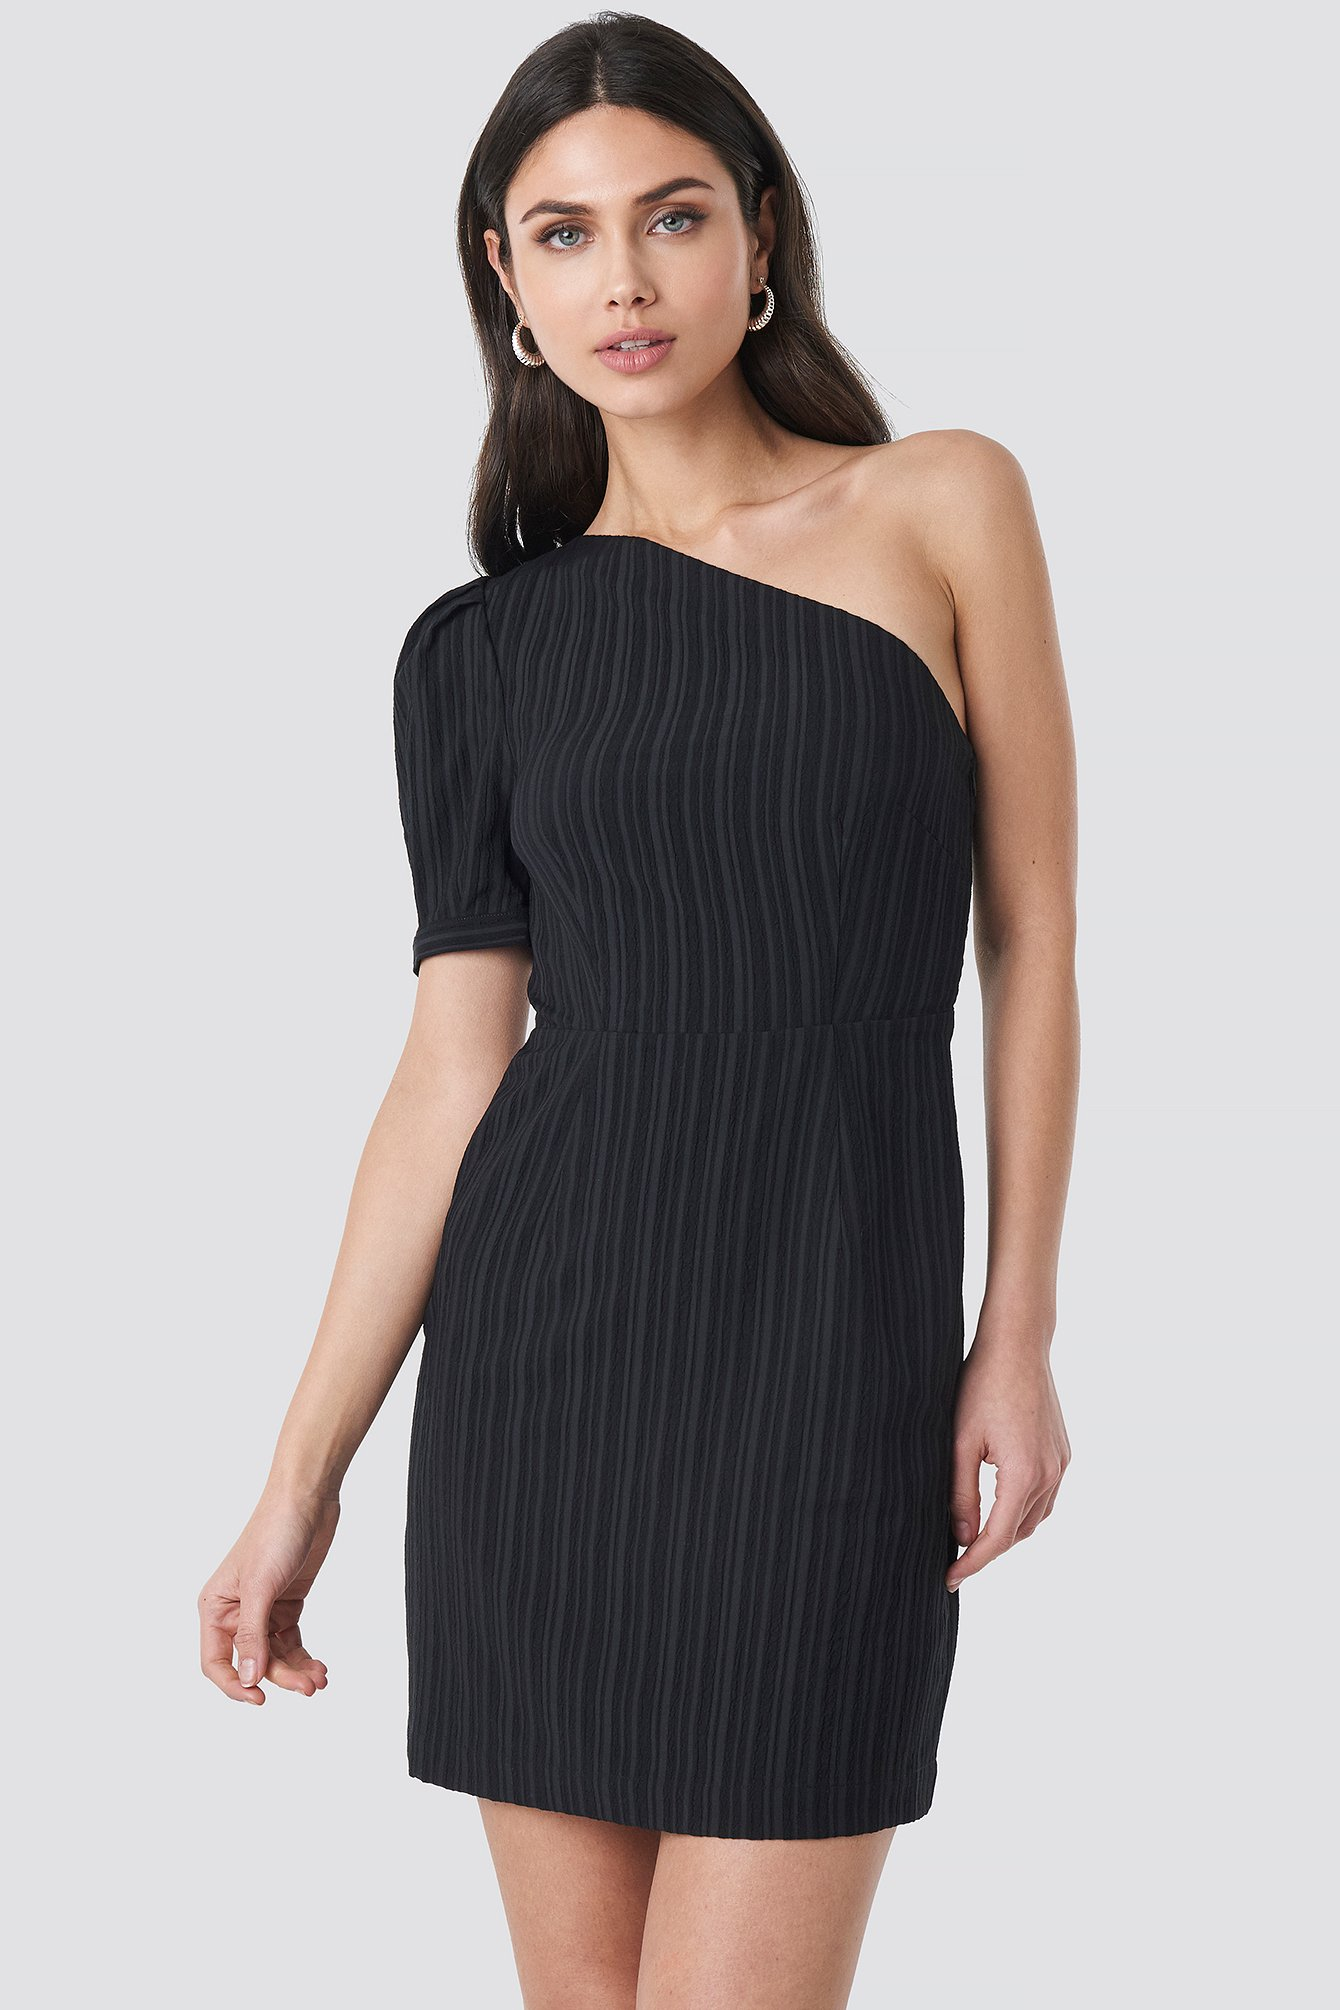 c3701d871c4 One Shoulder Puff Sleeve Mini Dress Black   na-kd.com